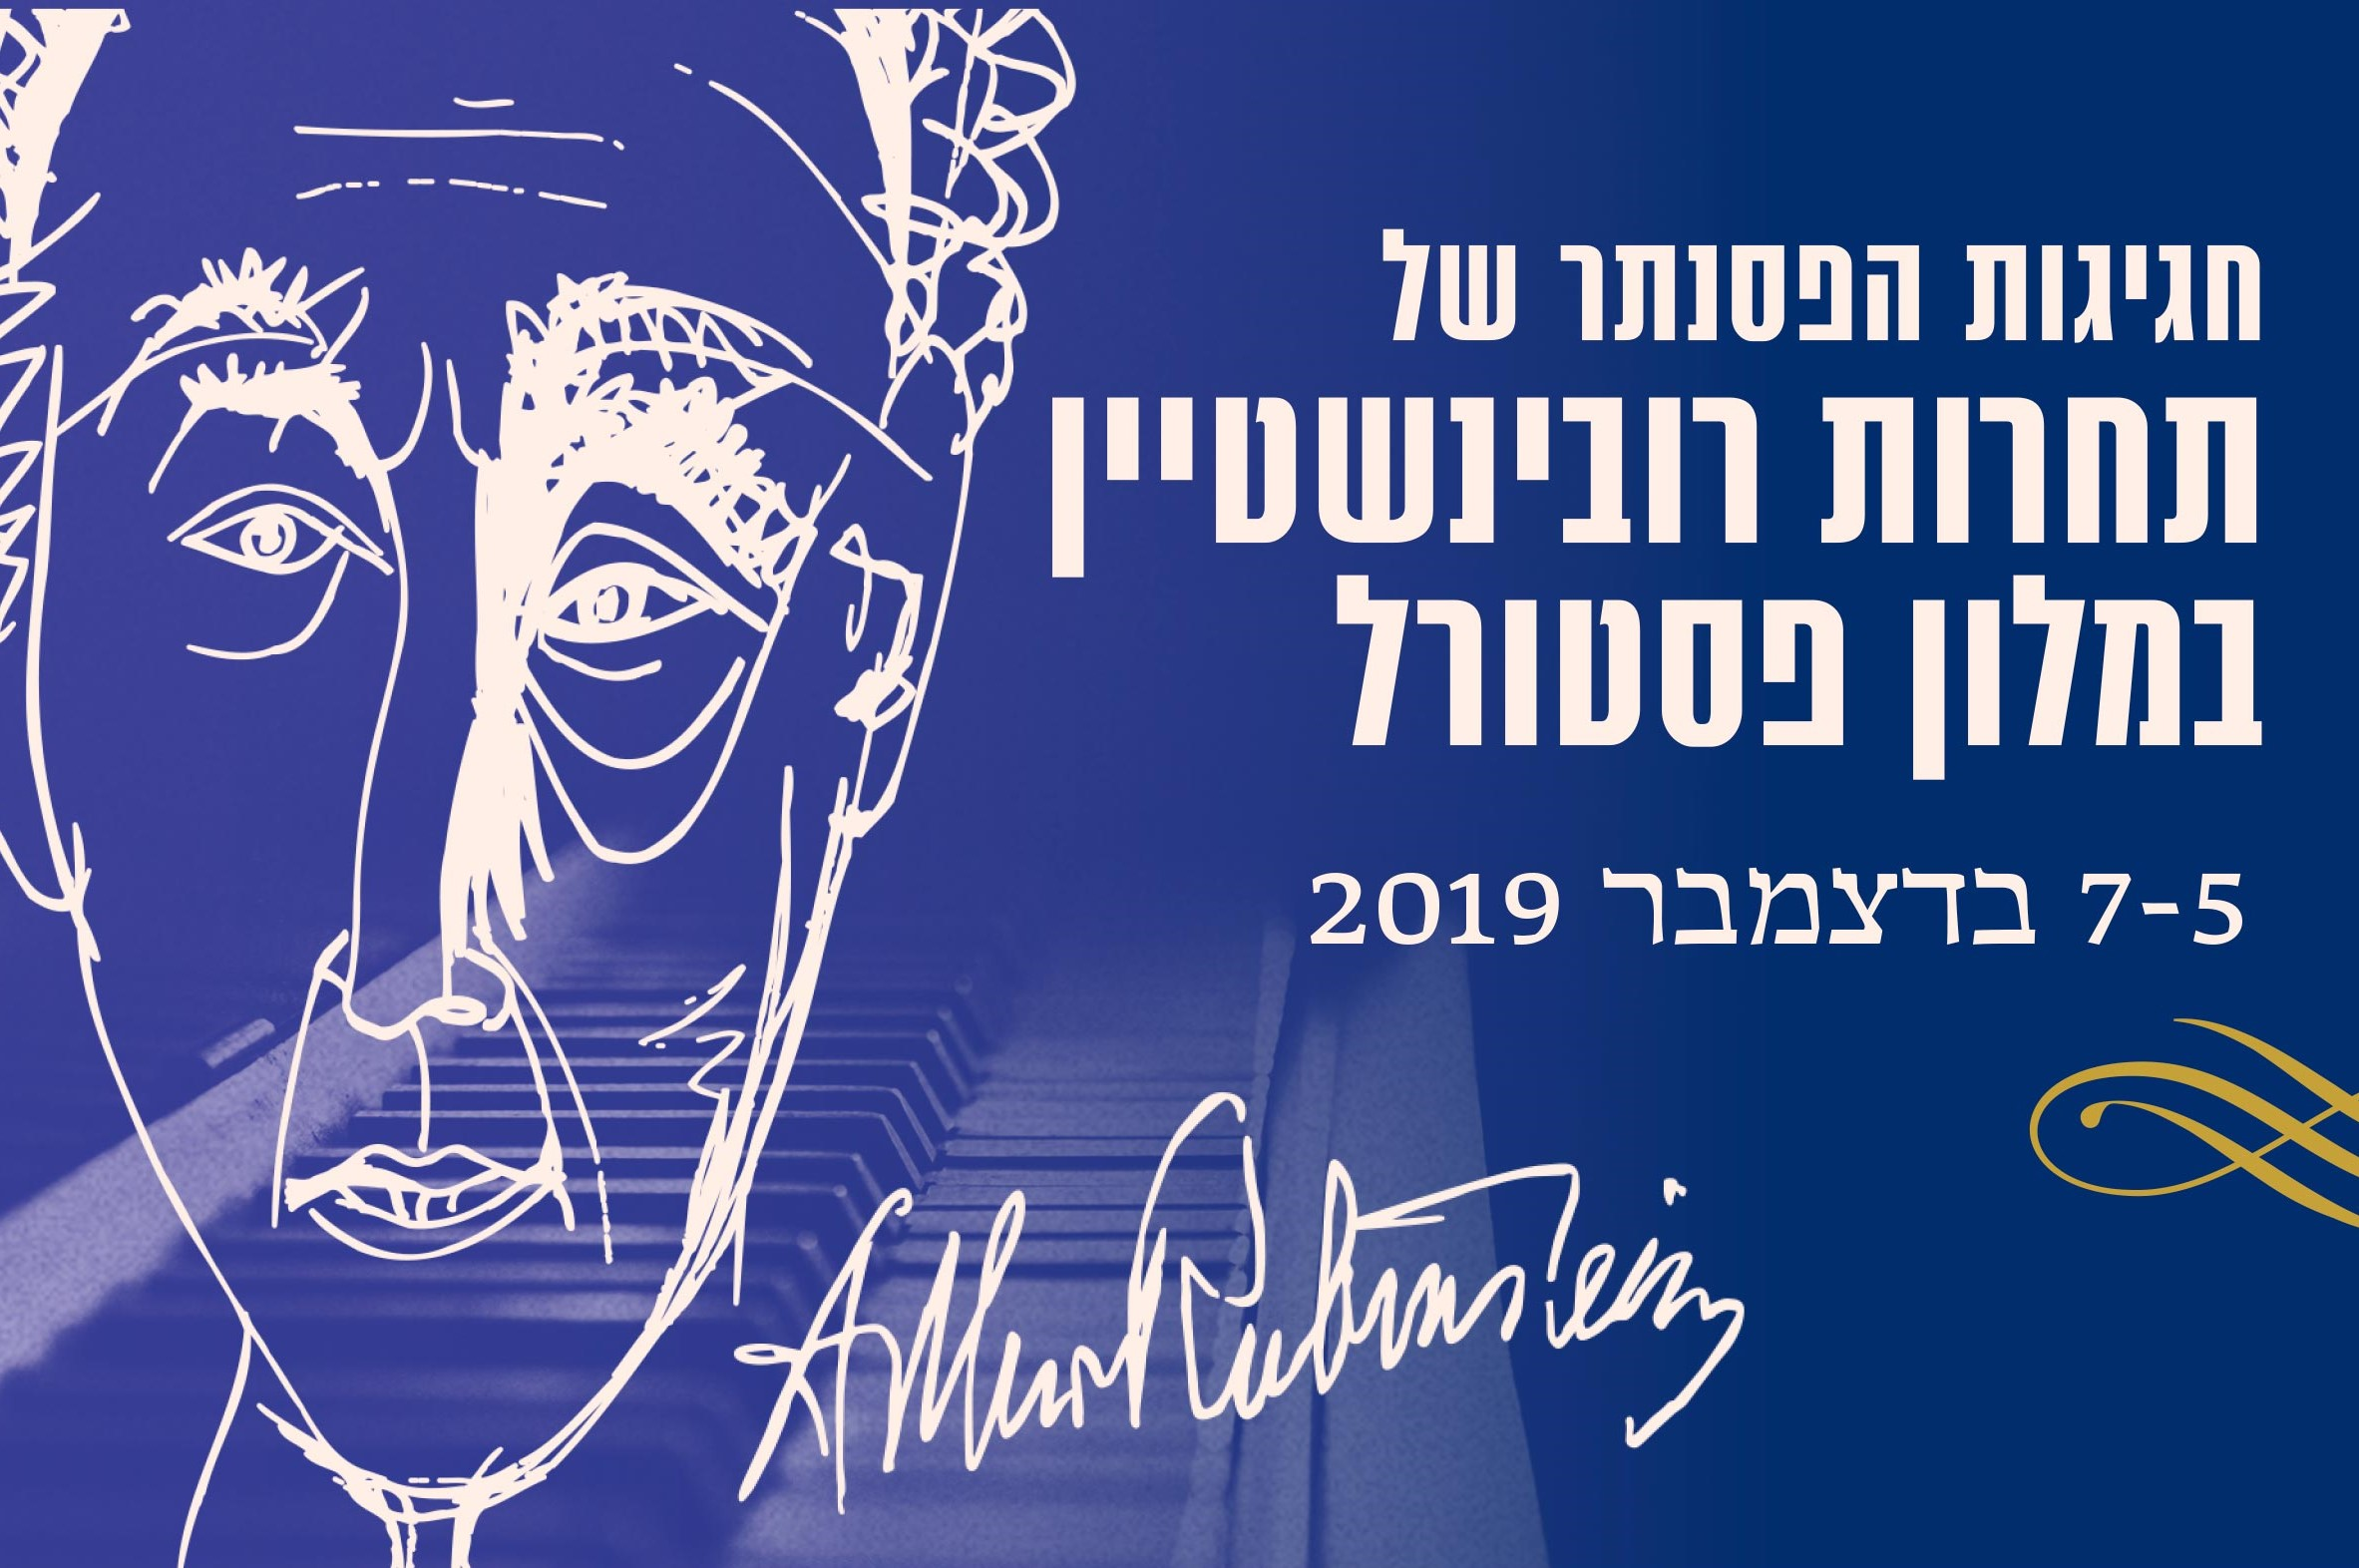 Arthur Rubinstein International Music Society